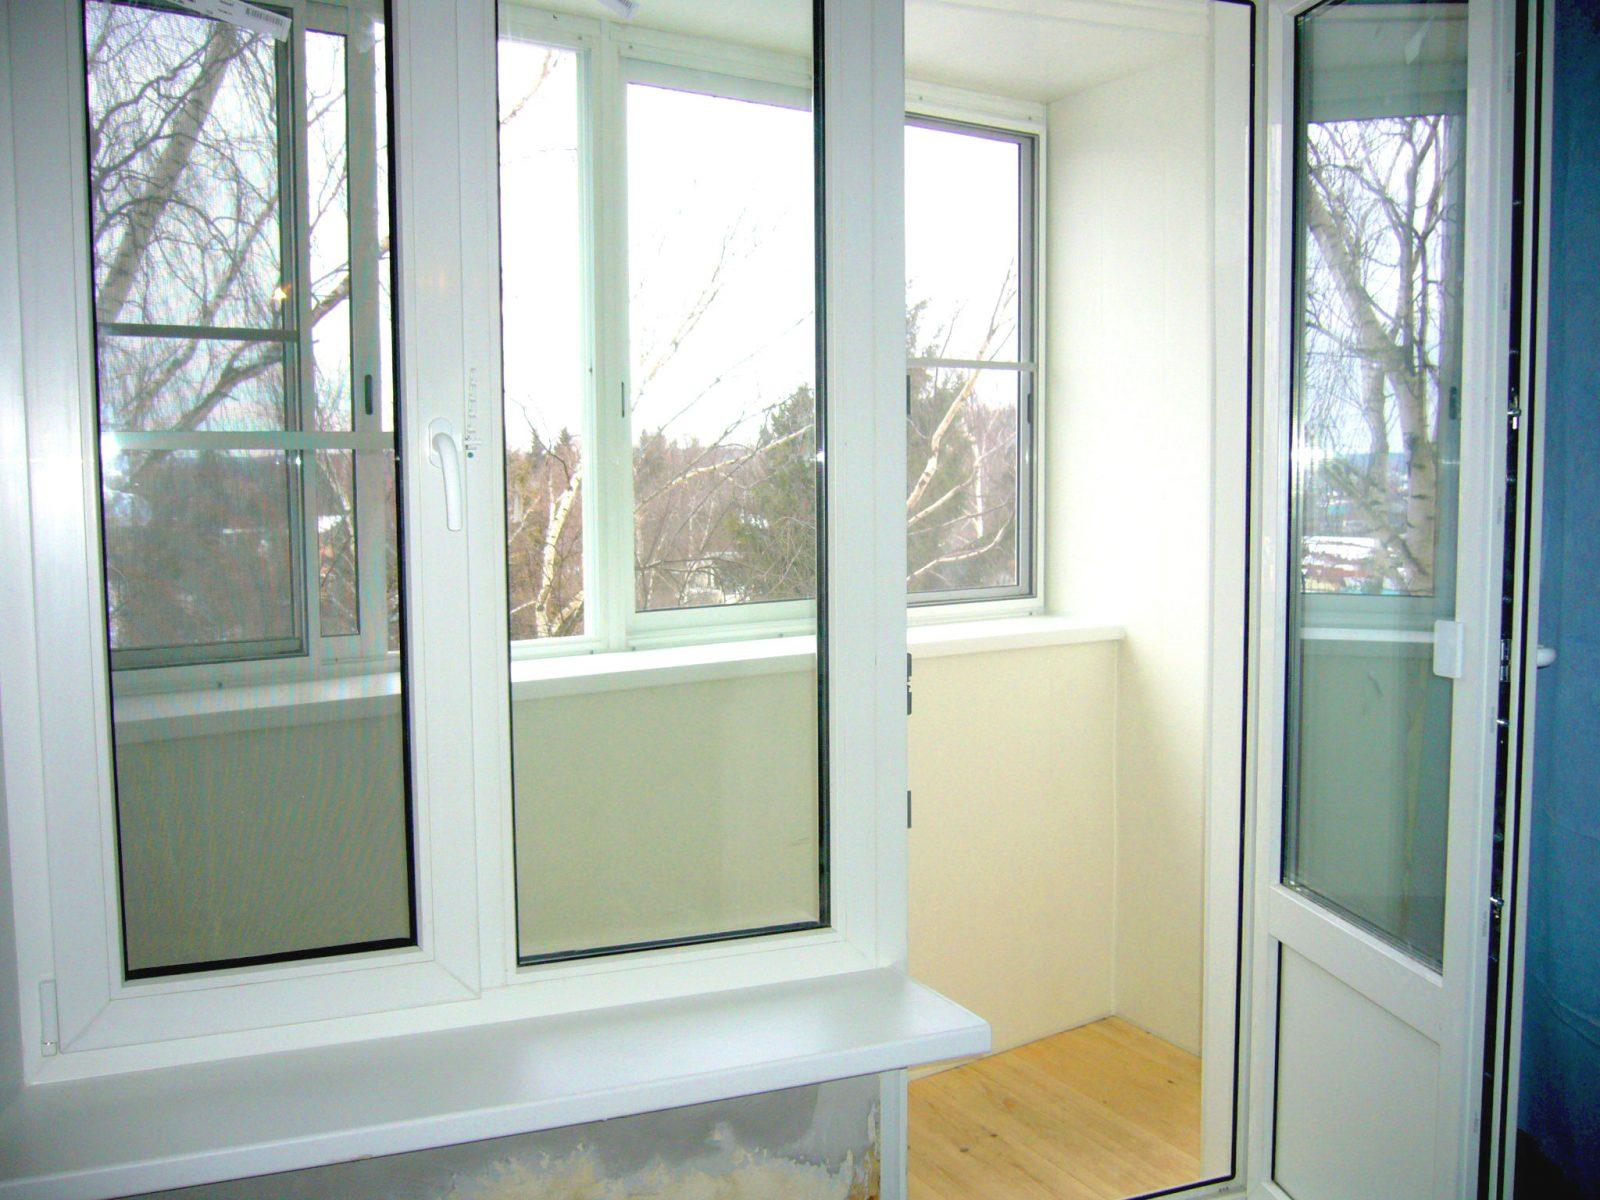 Москва: пластиковые окна,отделка балконов и лоджий цена 0 р..